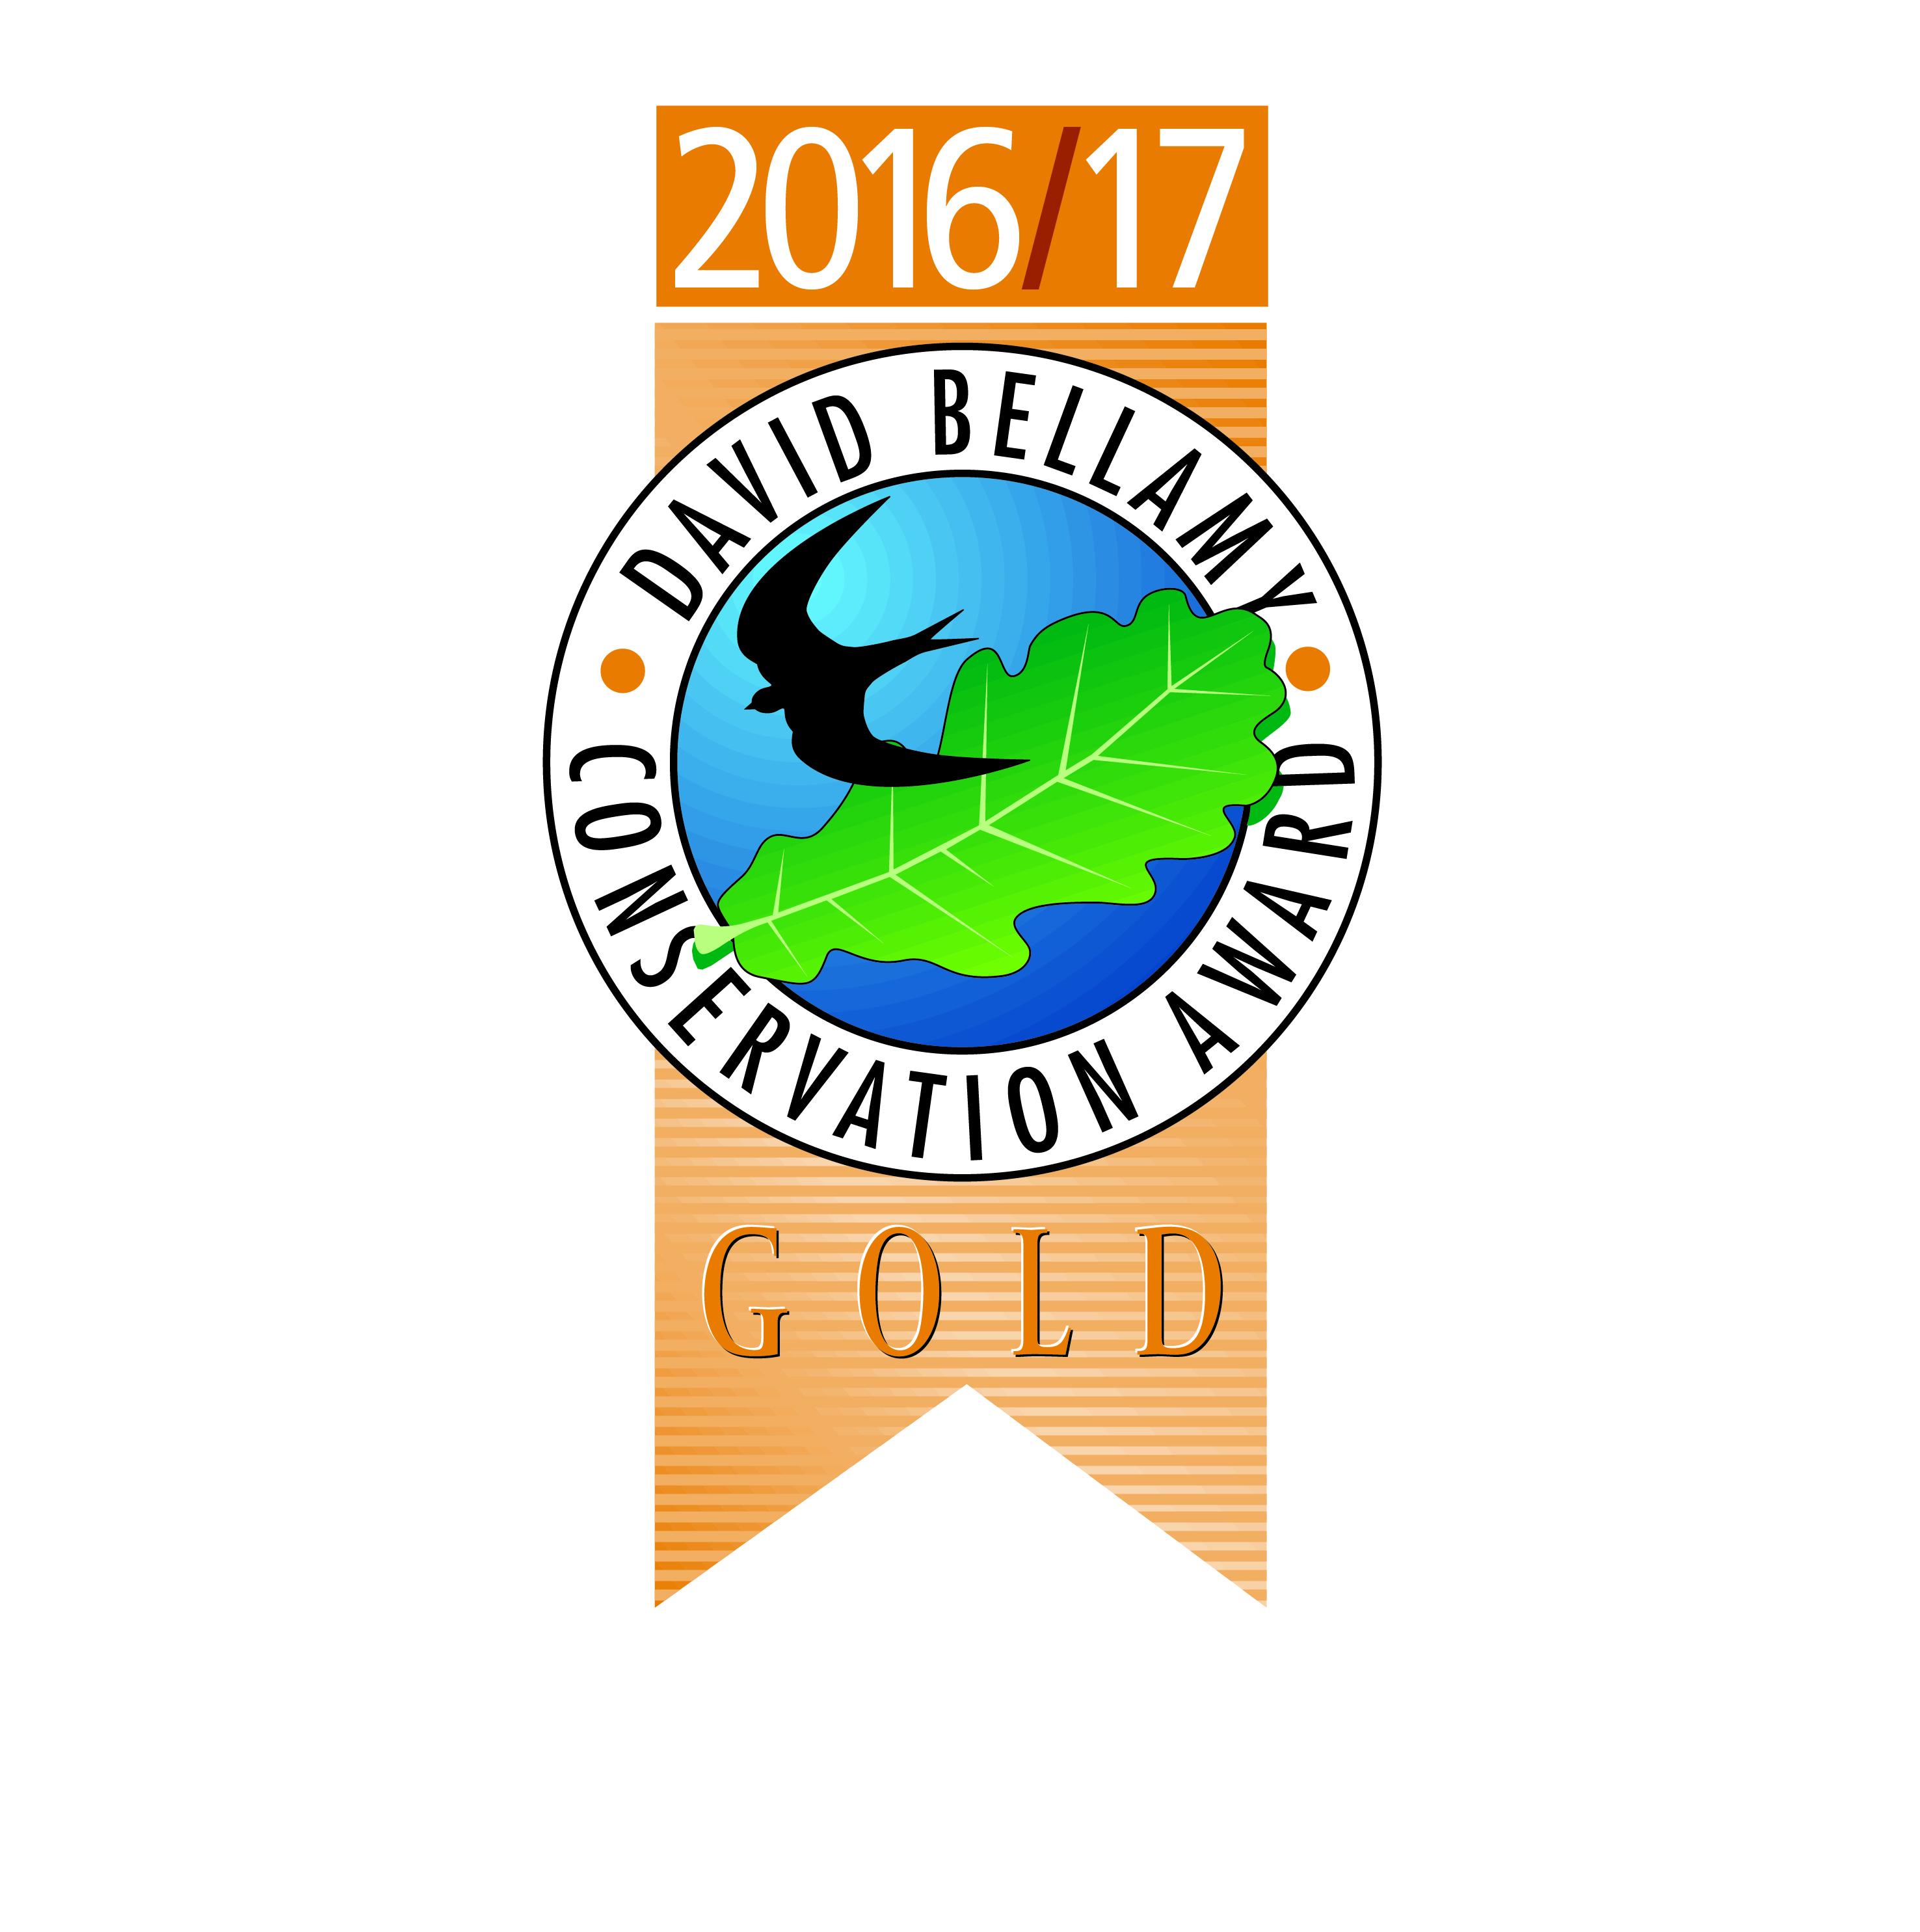 bellamy-2016-17